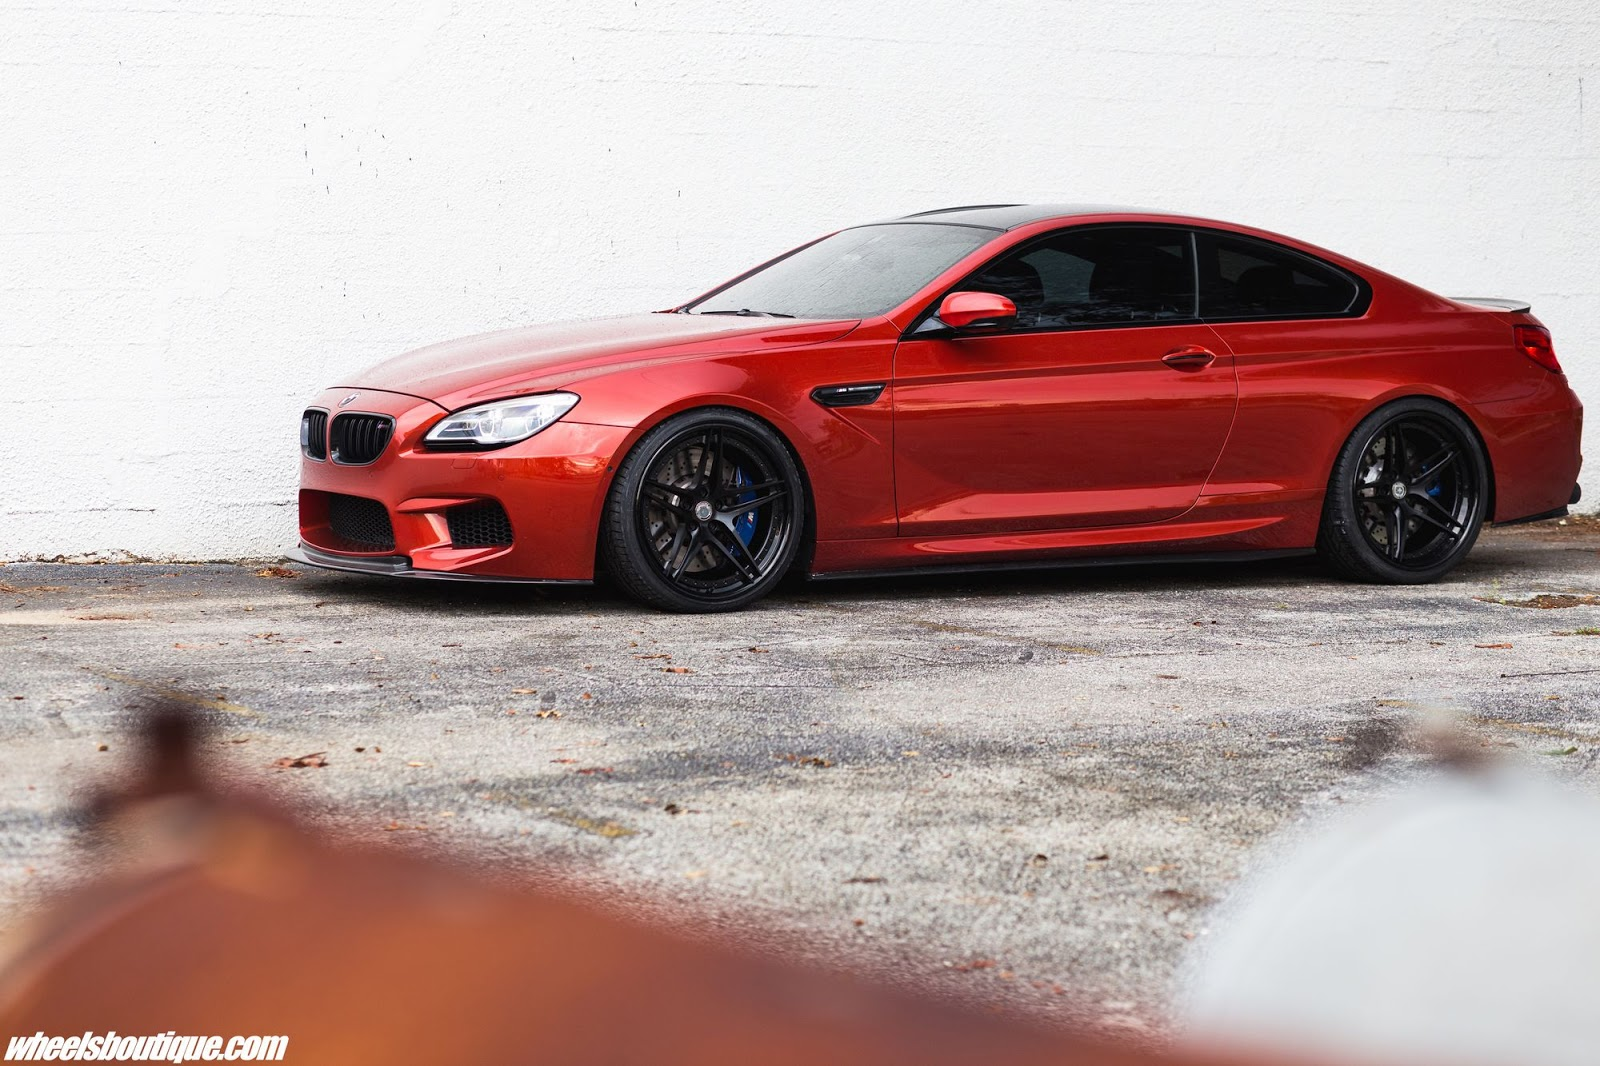 Sakhir Orange Bmw M6 Looks Monstrous With Black Wheels